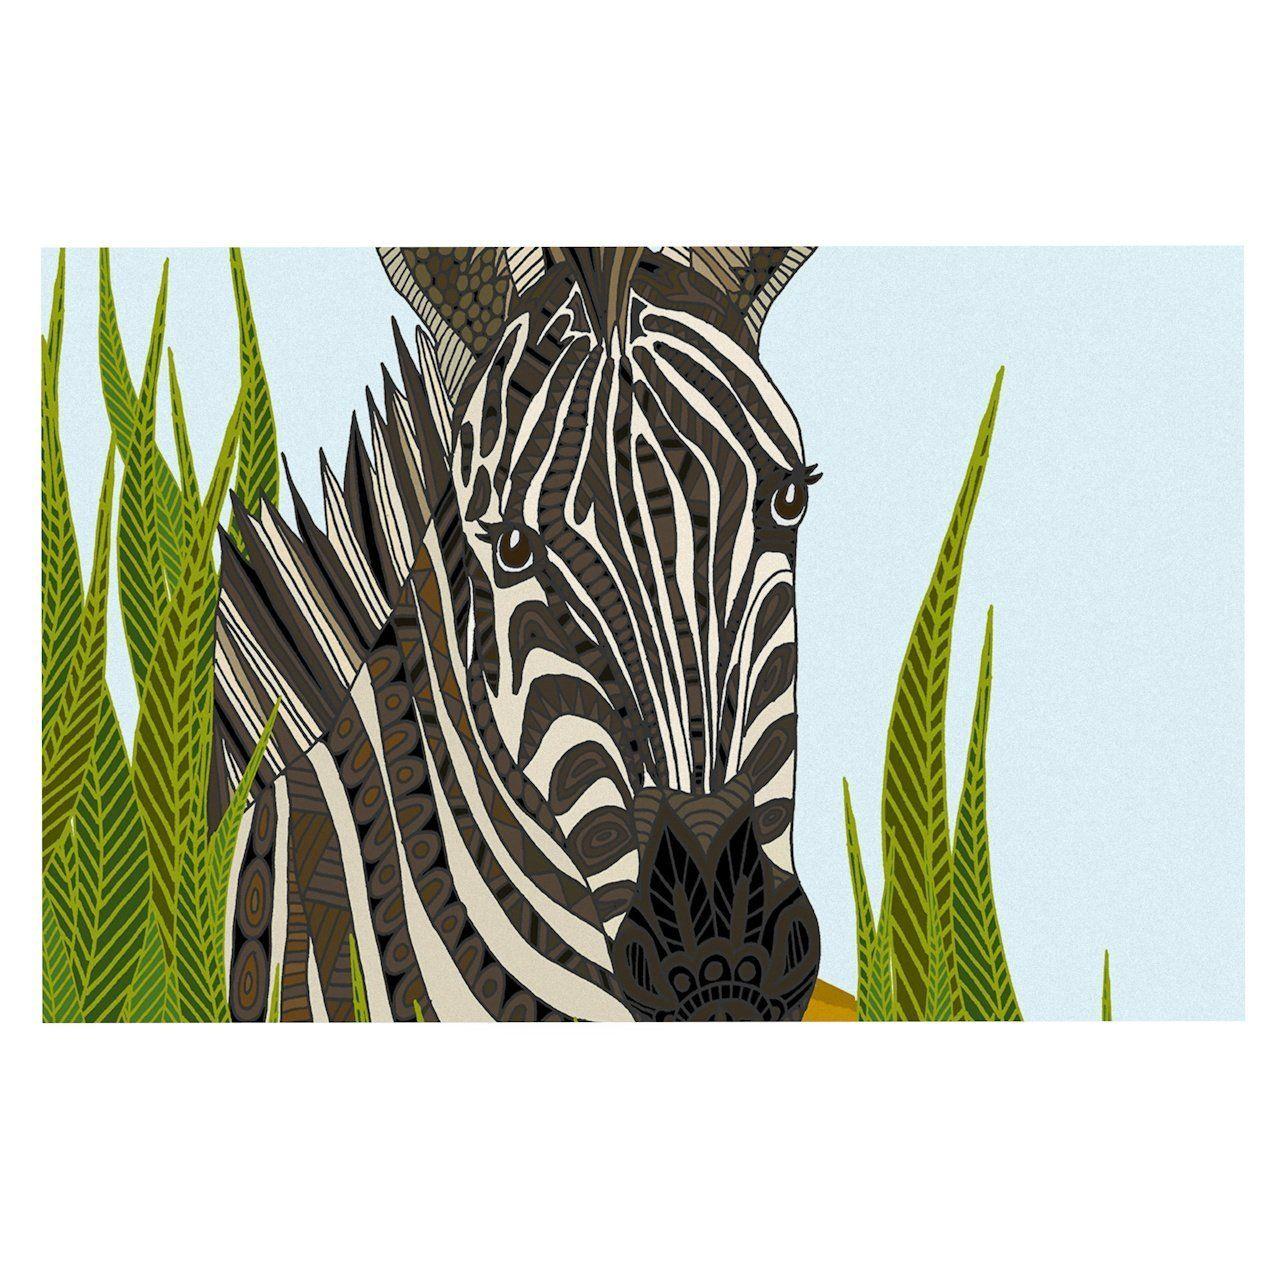 30 x 20 Kess InHouse Art Love Passion Zebra Black White Fleece Pillow Case